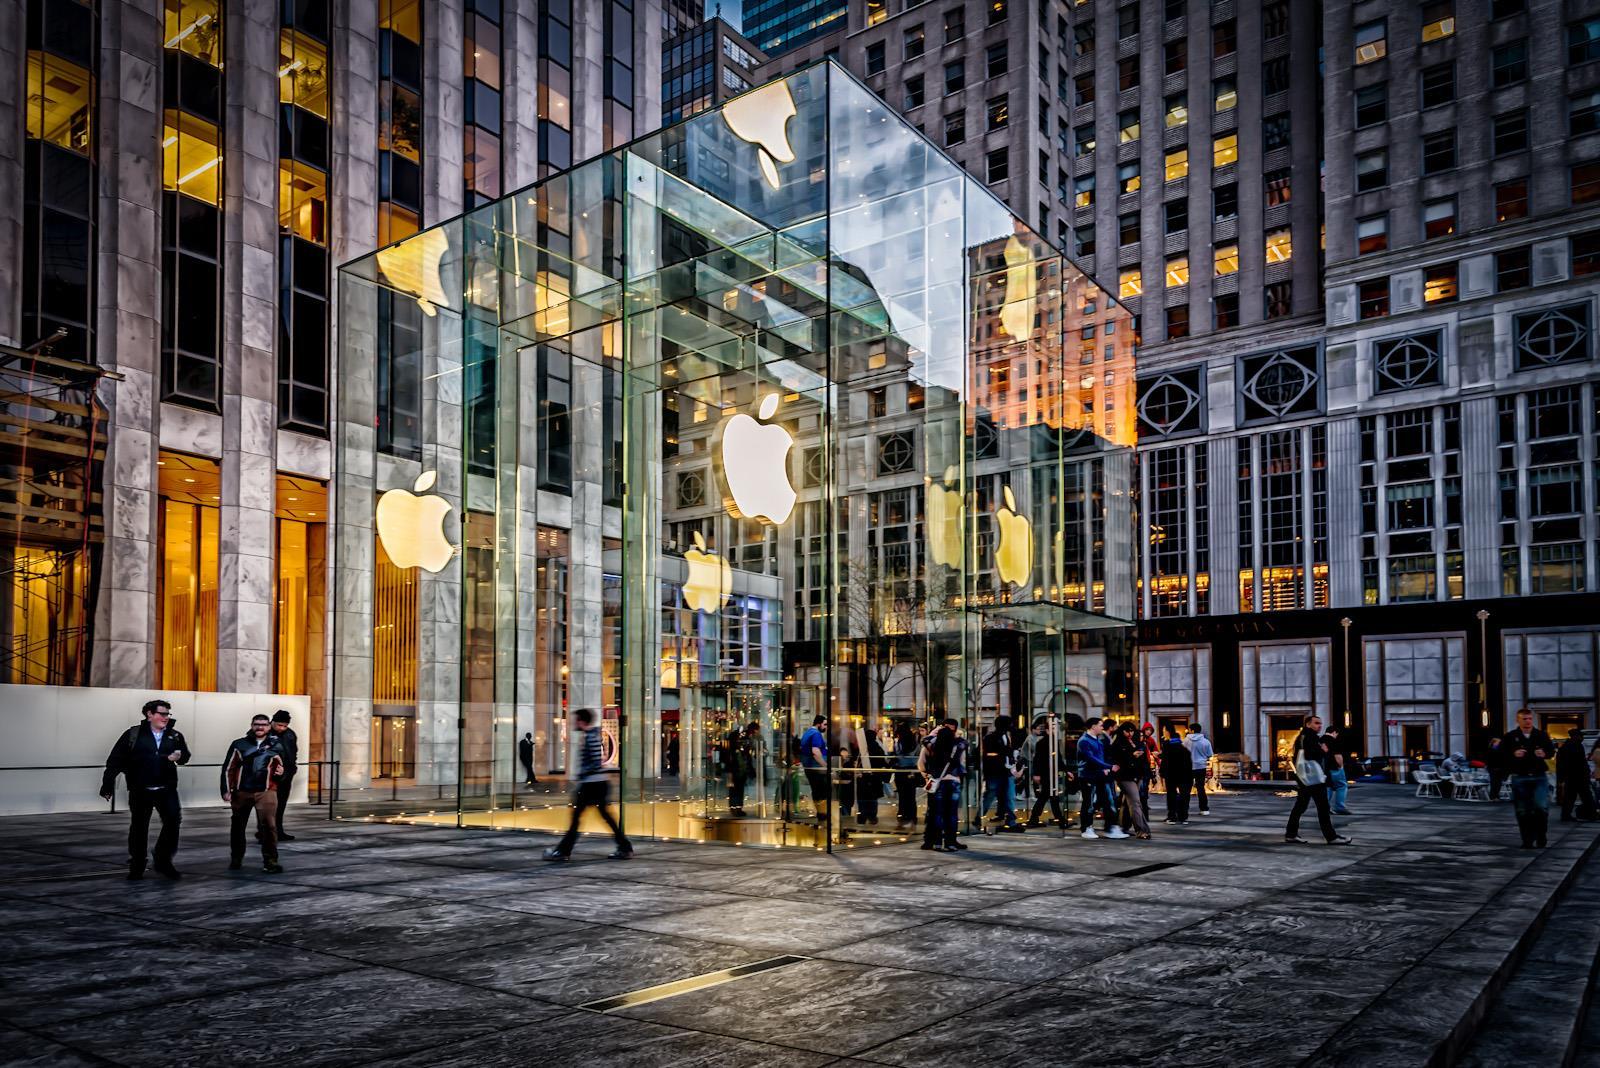 Apple Store in New York City